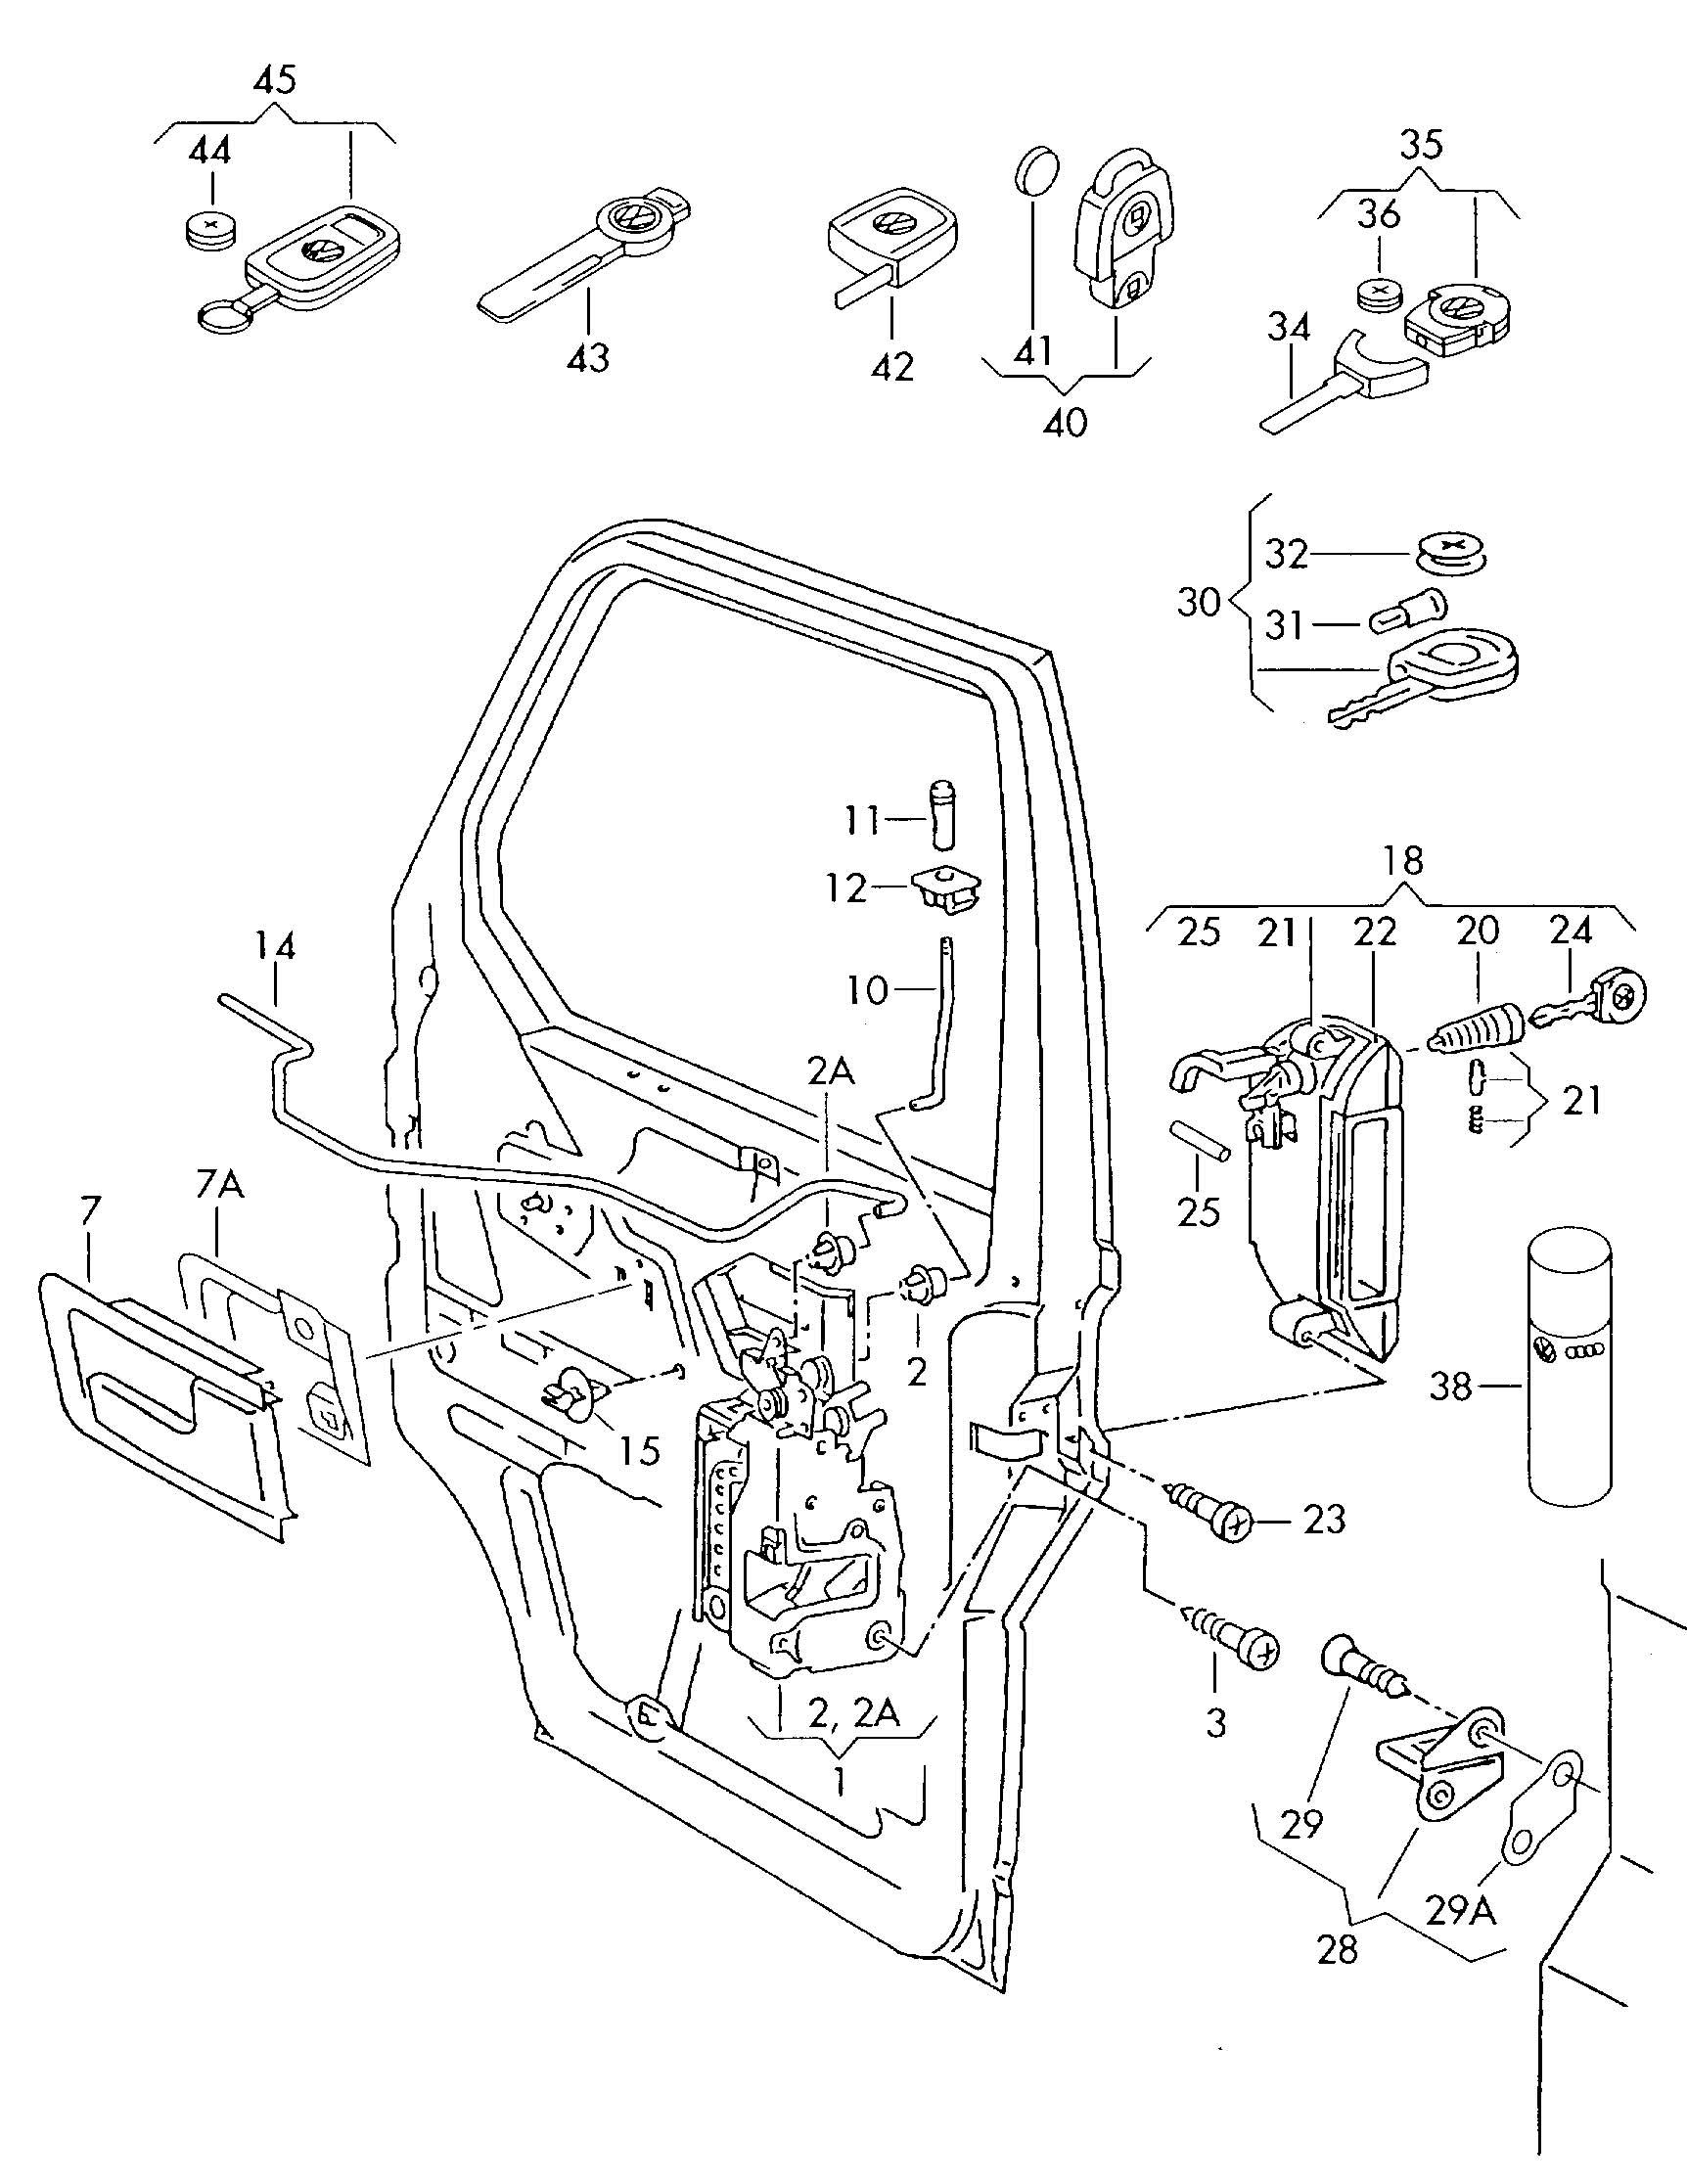 Vw 1600 cc engine diagram